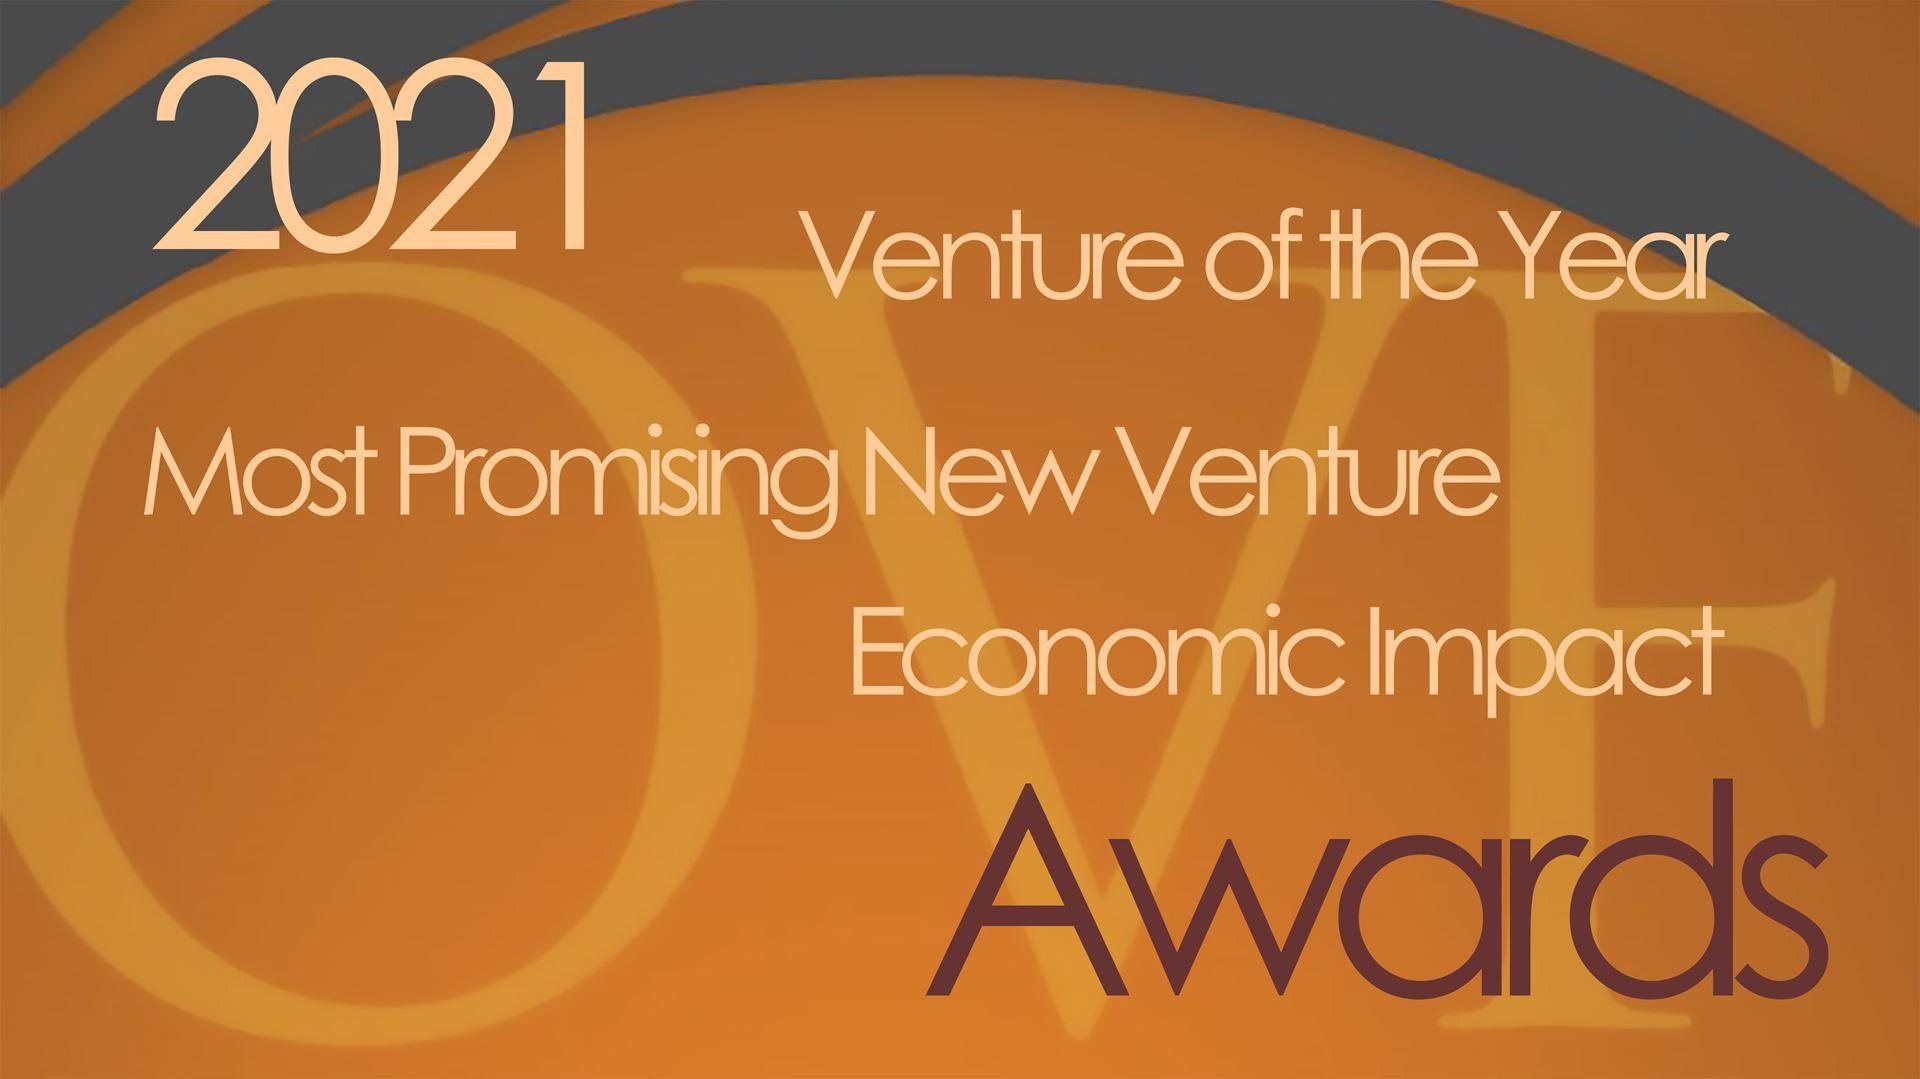 Most Promising New Venture Winners